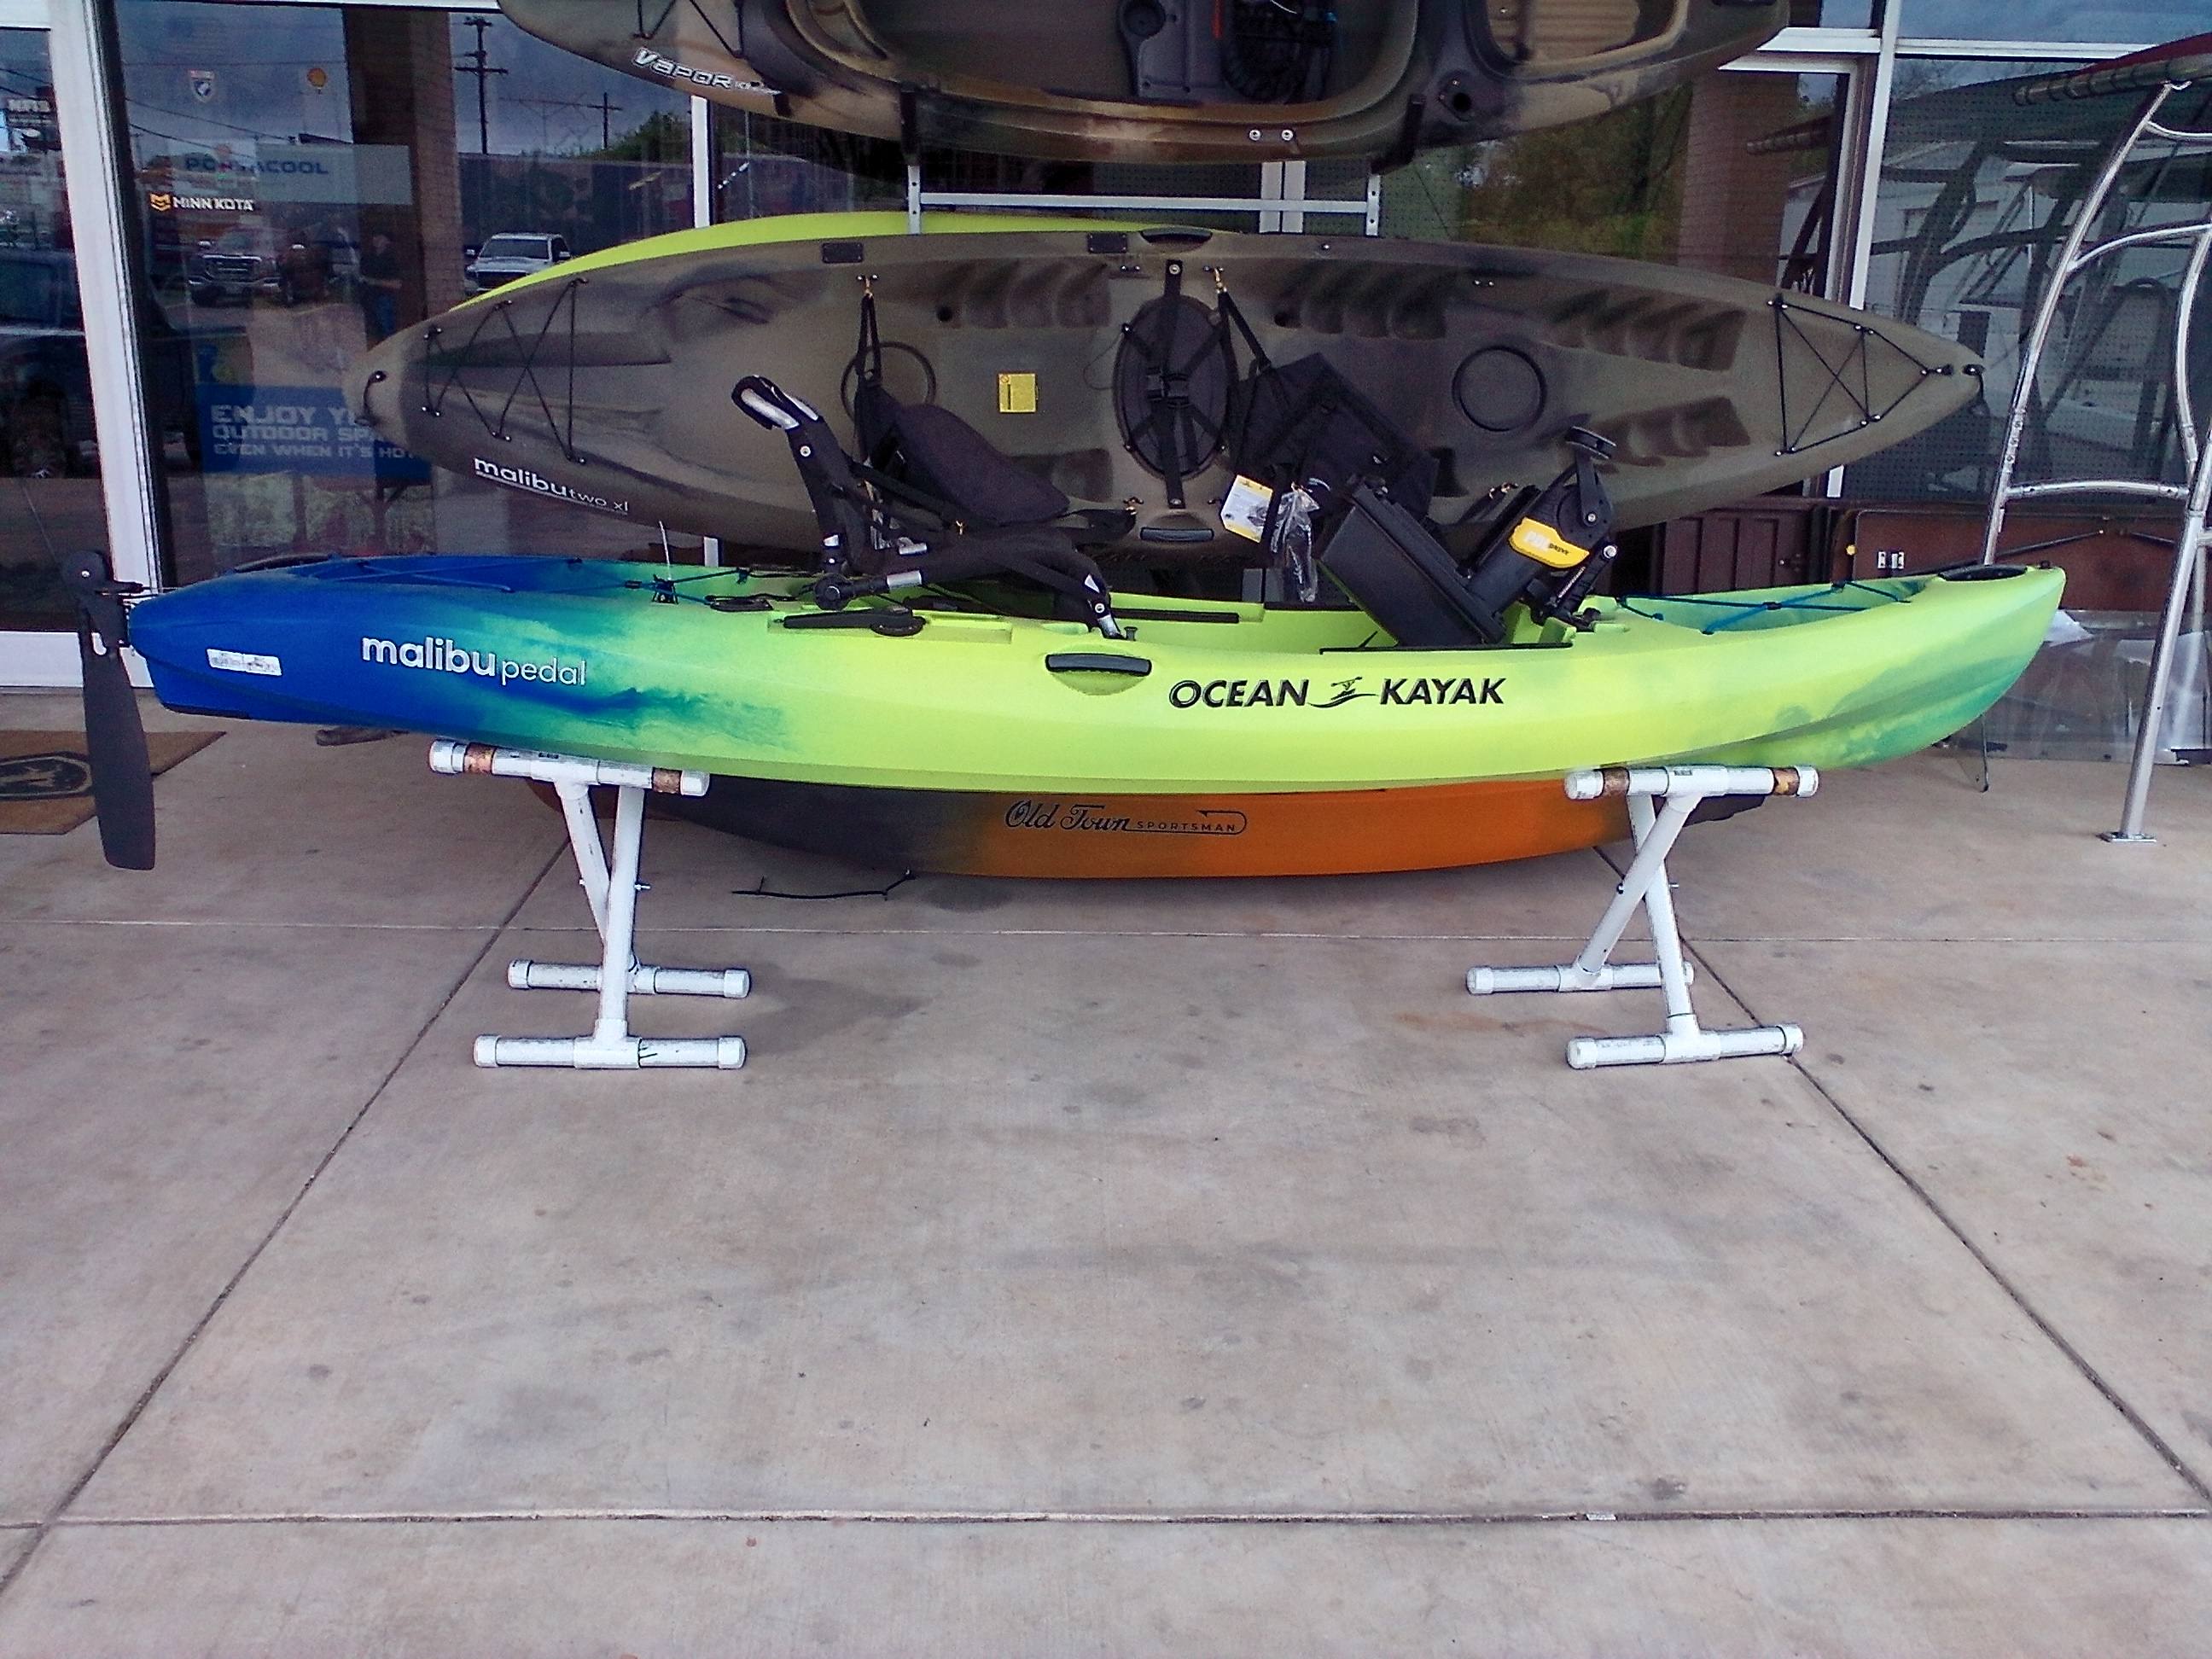 2021 Ocean Kayak boat for sale, model of the boat is Malibu PDL 12 & Image # 1 of 3